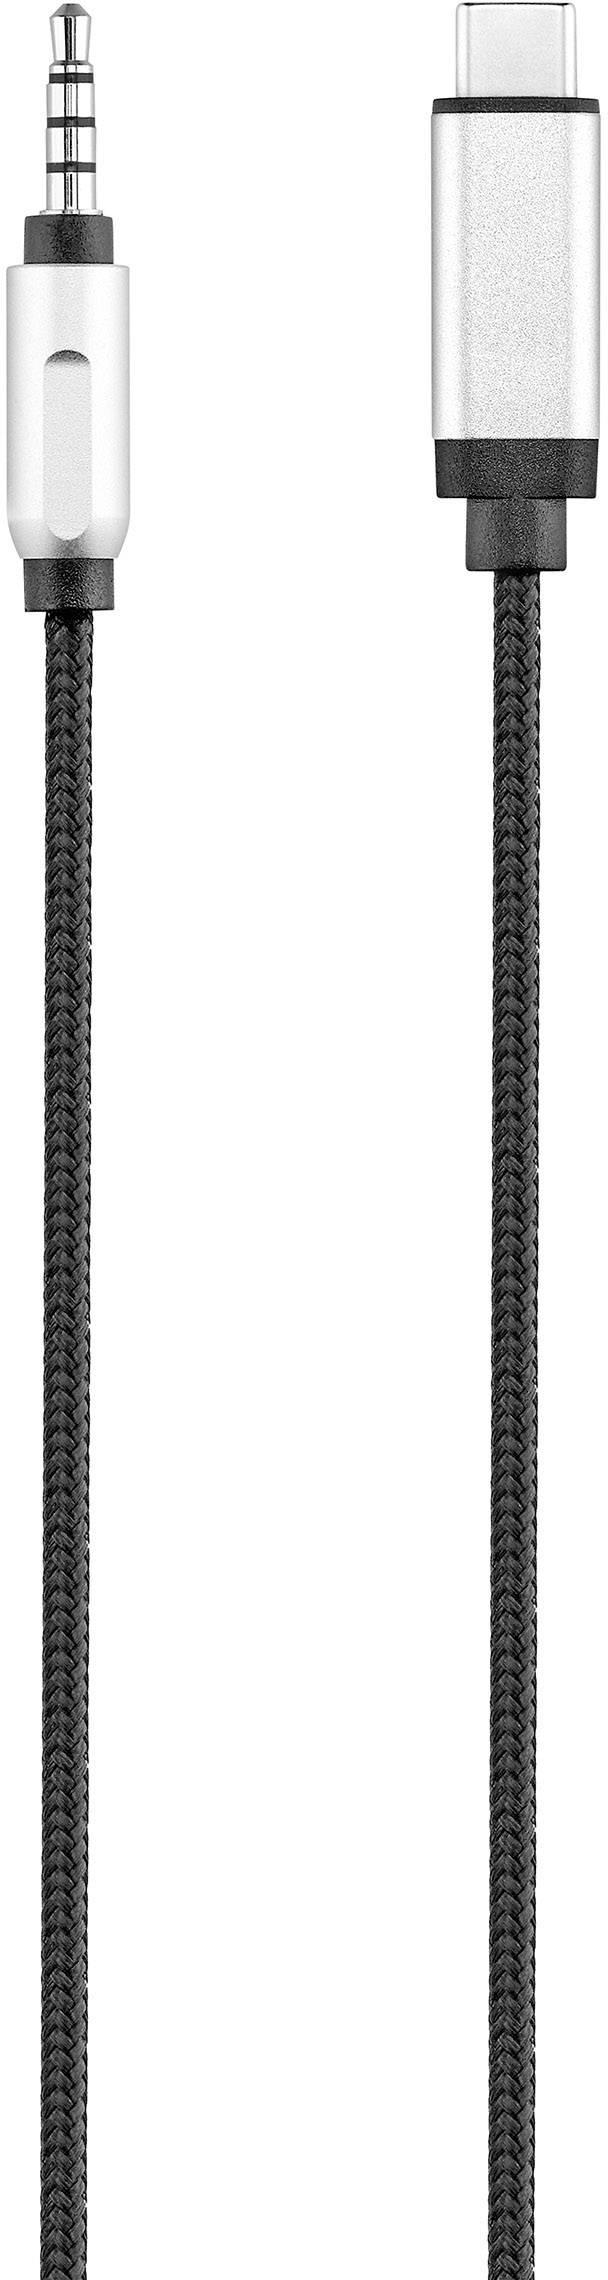 USB / jack audio kabel Renkforce RF-3432030, 1.2 m, černá